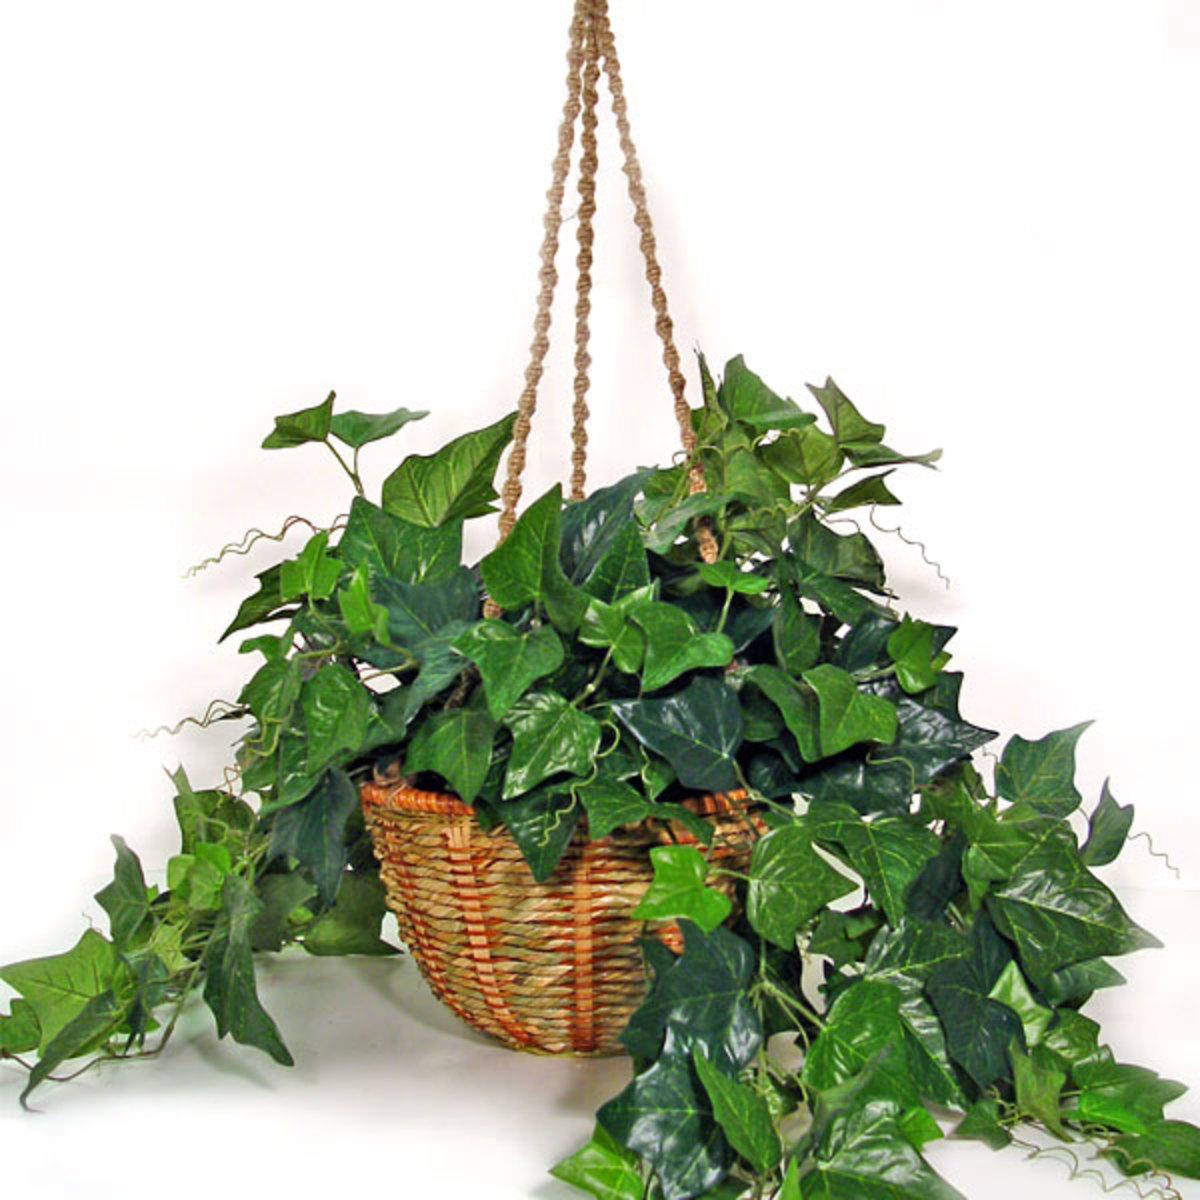 Types of Climbing Plants